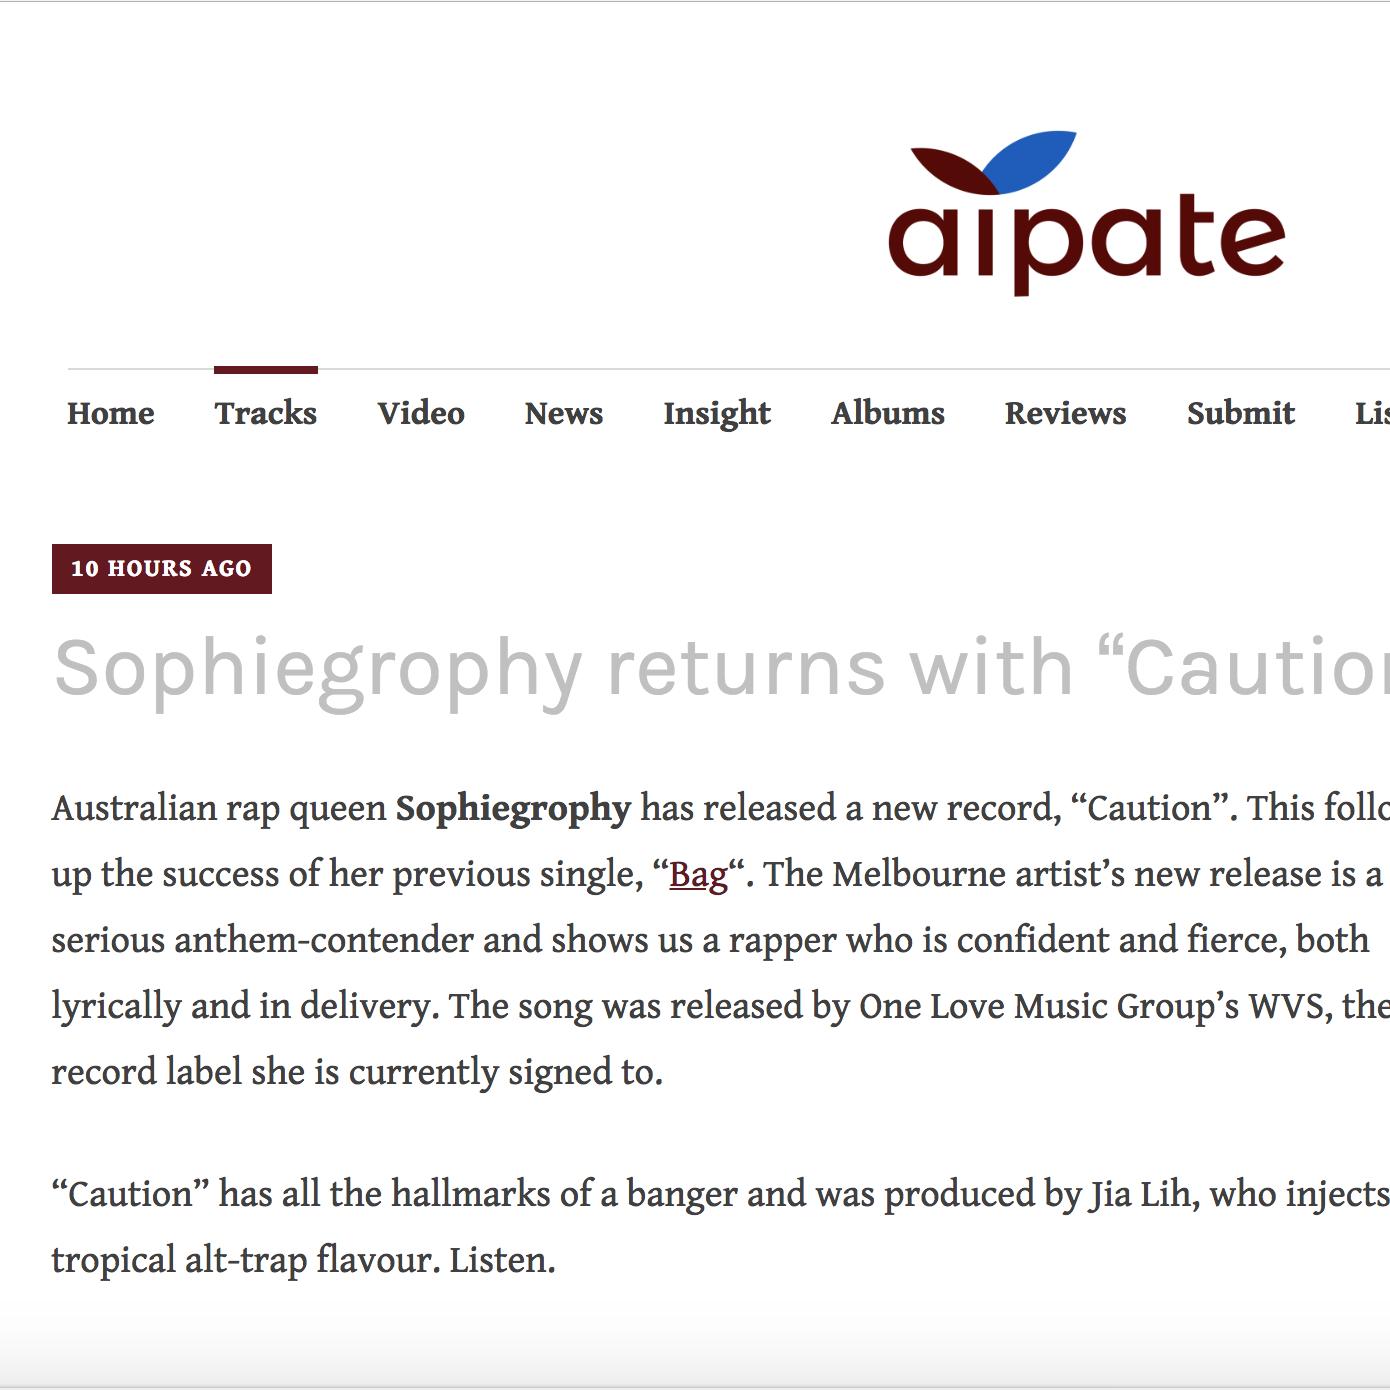 Aipate - September 4th 2018